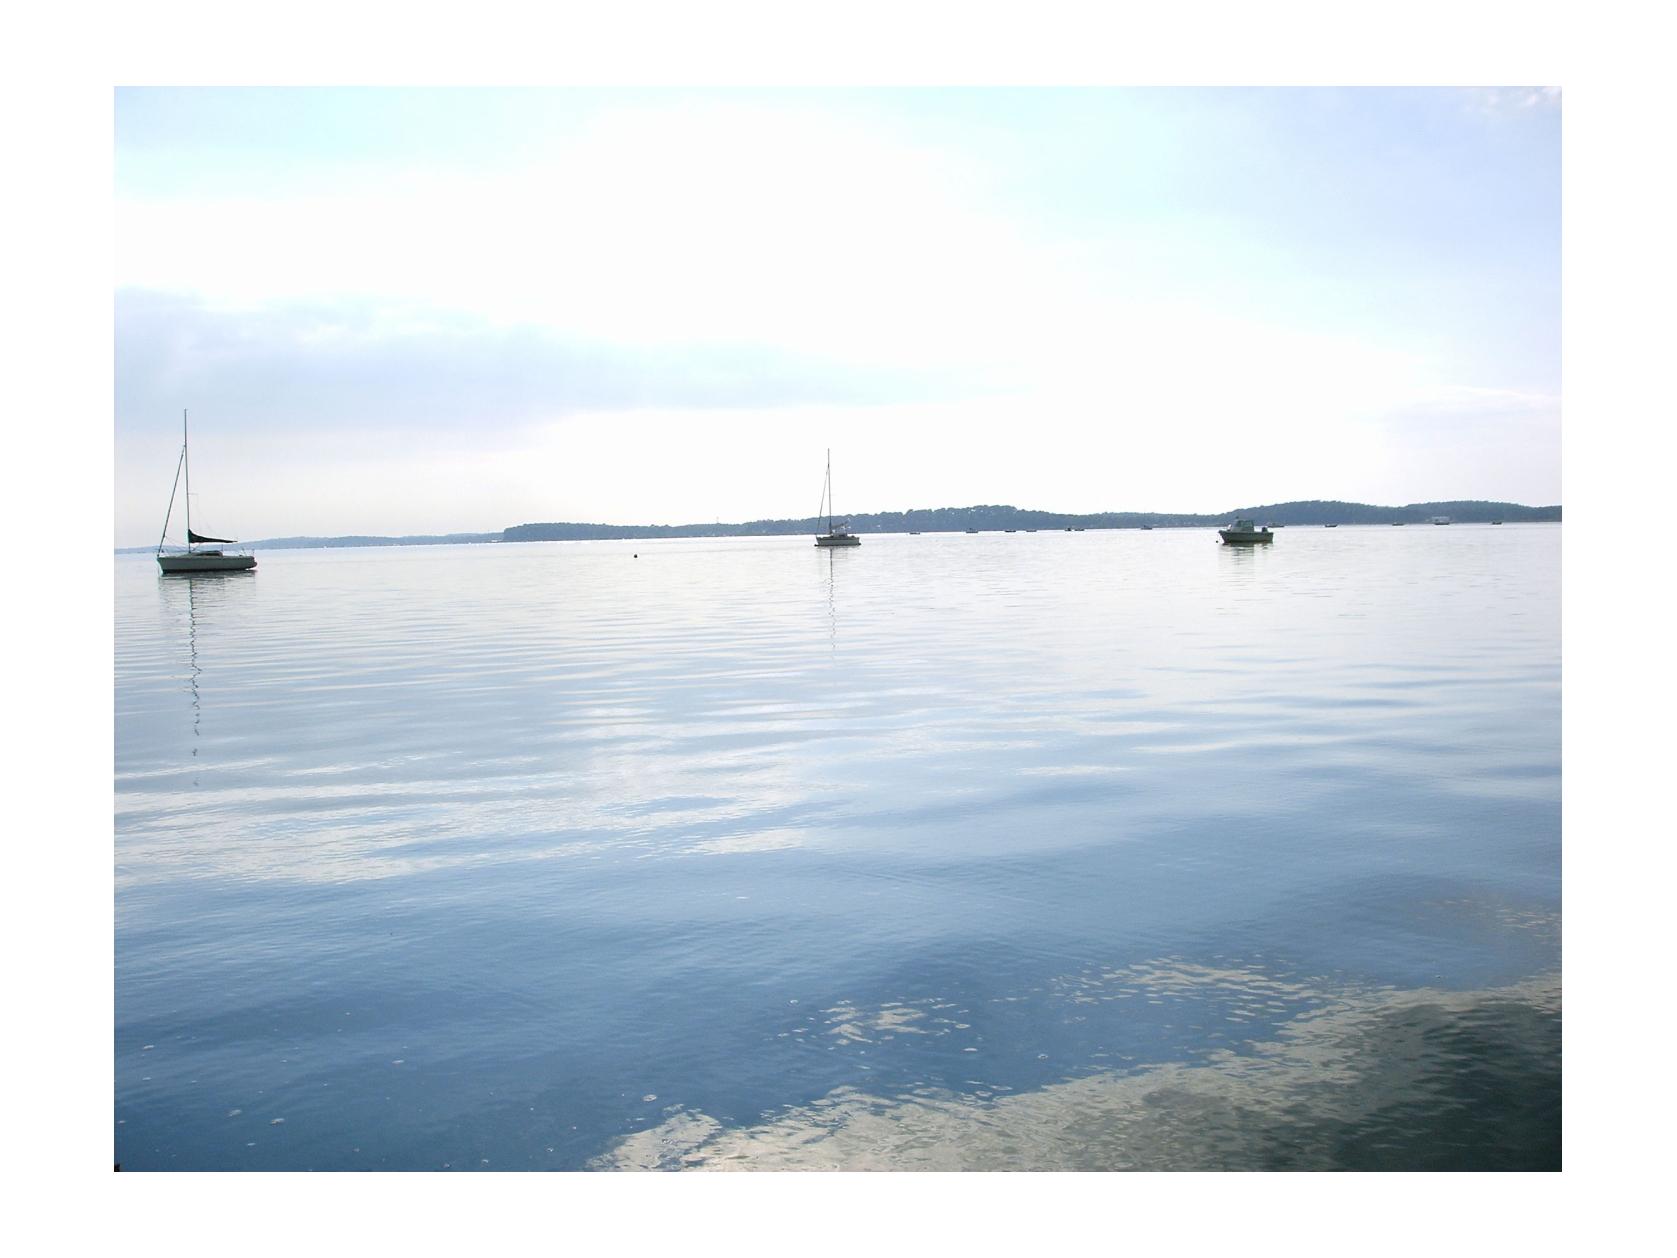 Foulques les voyages immobiles for Bassin miroir